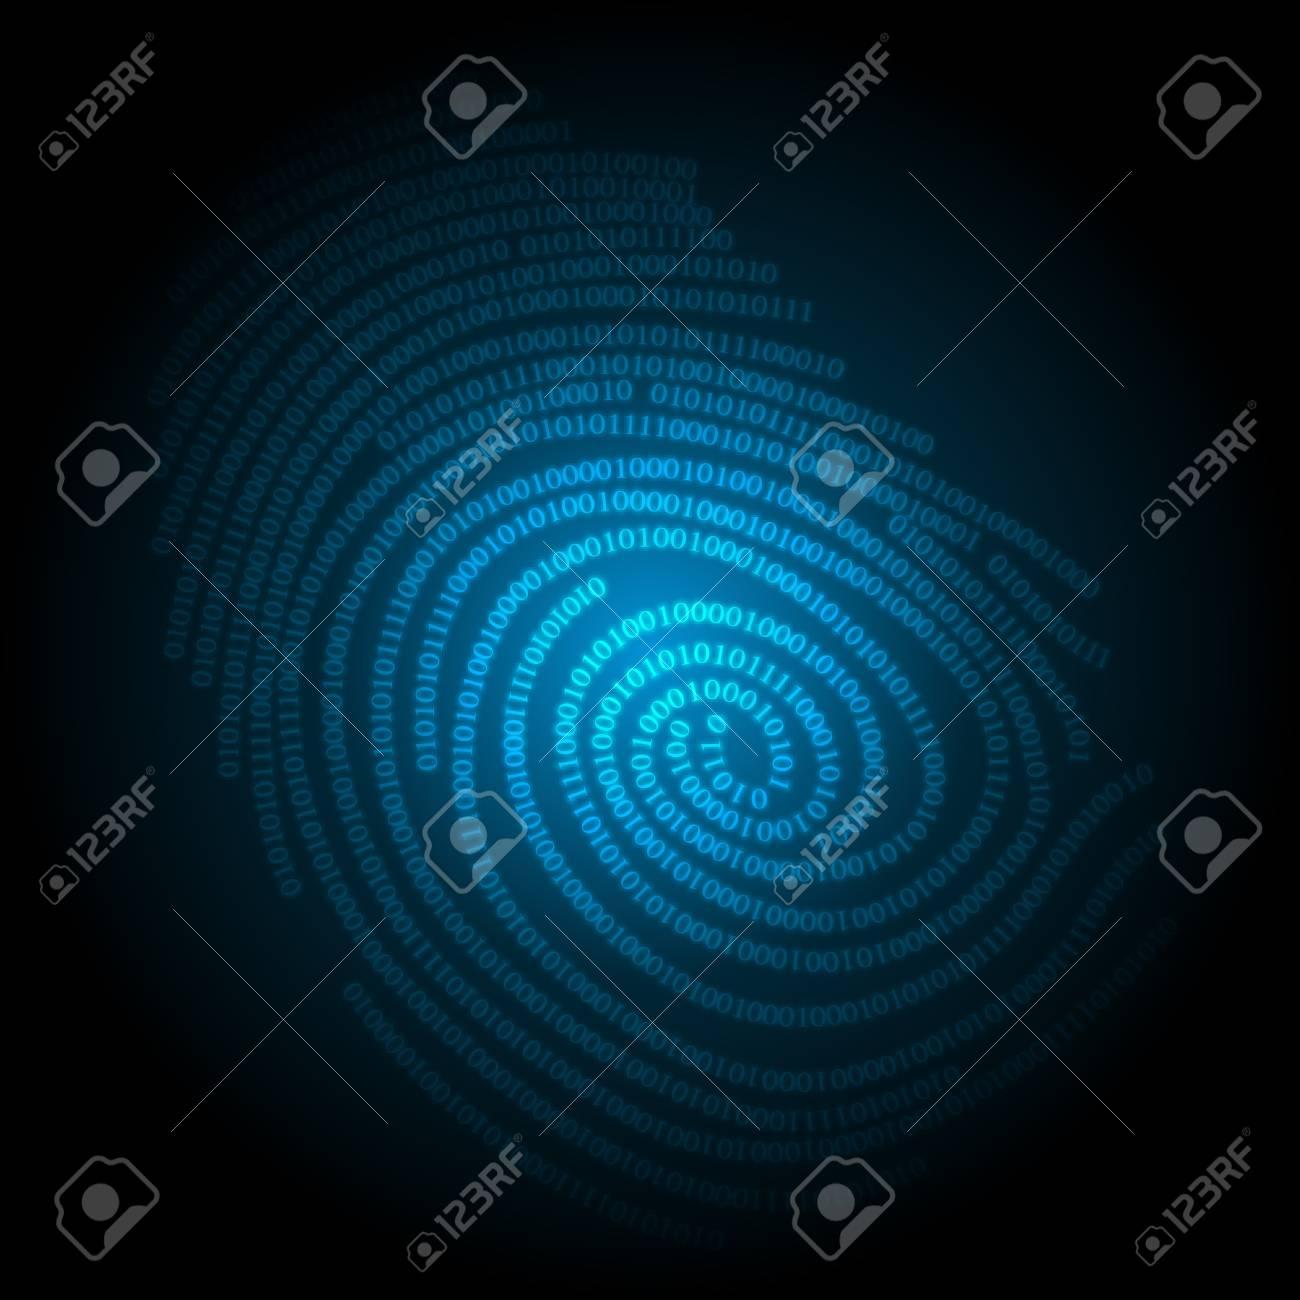 blue technology background, vector illustration eps10 Stock Vector - 14152898